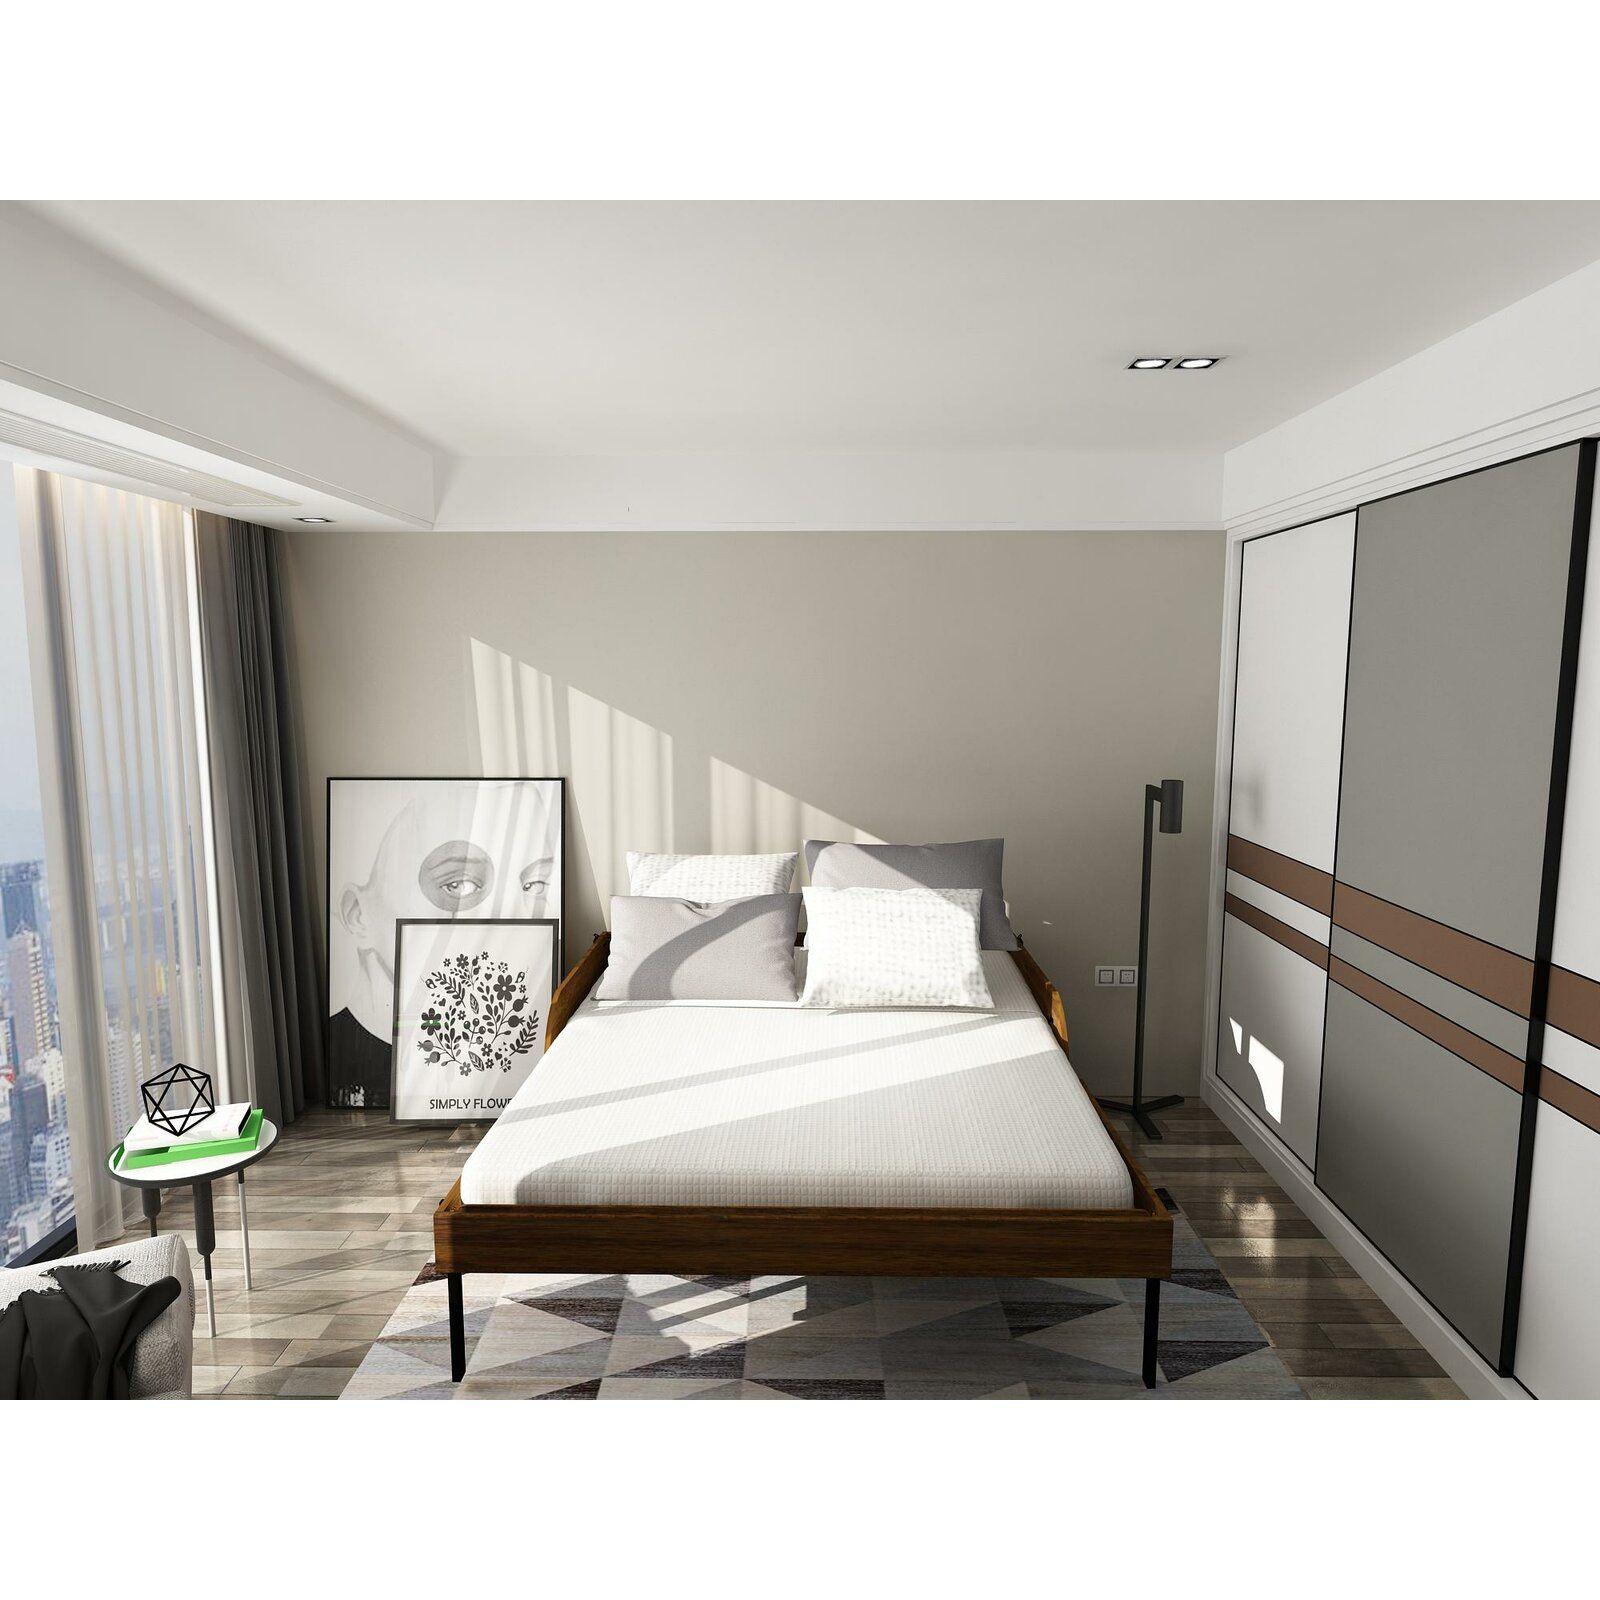 Rolling Queen Murphy Bed with Mattress Murphy bed plans